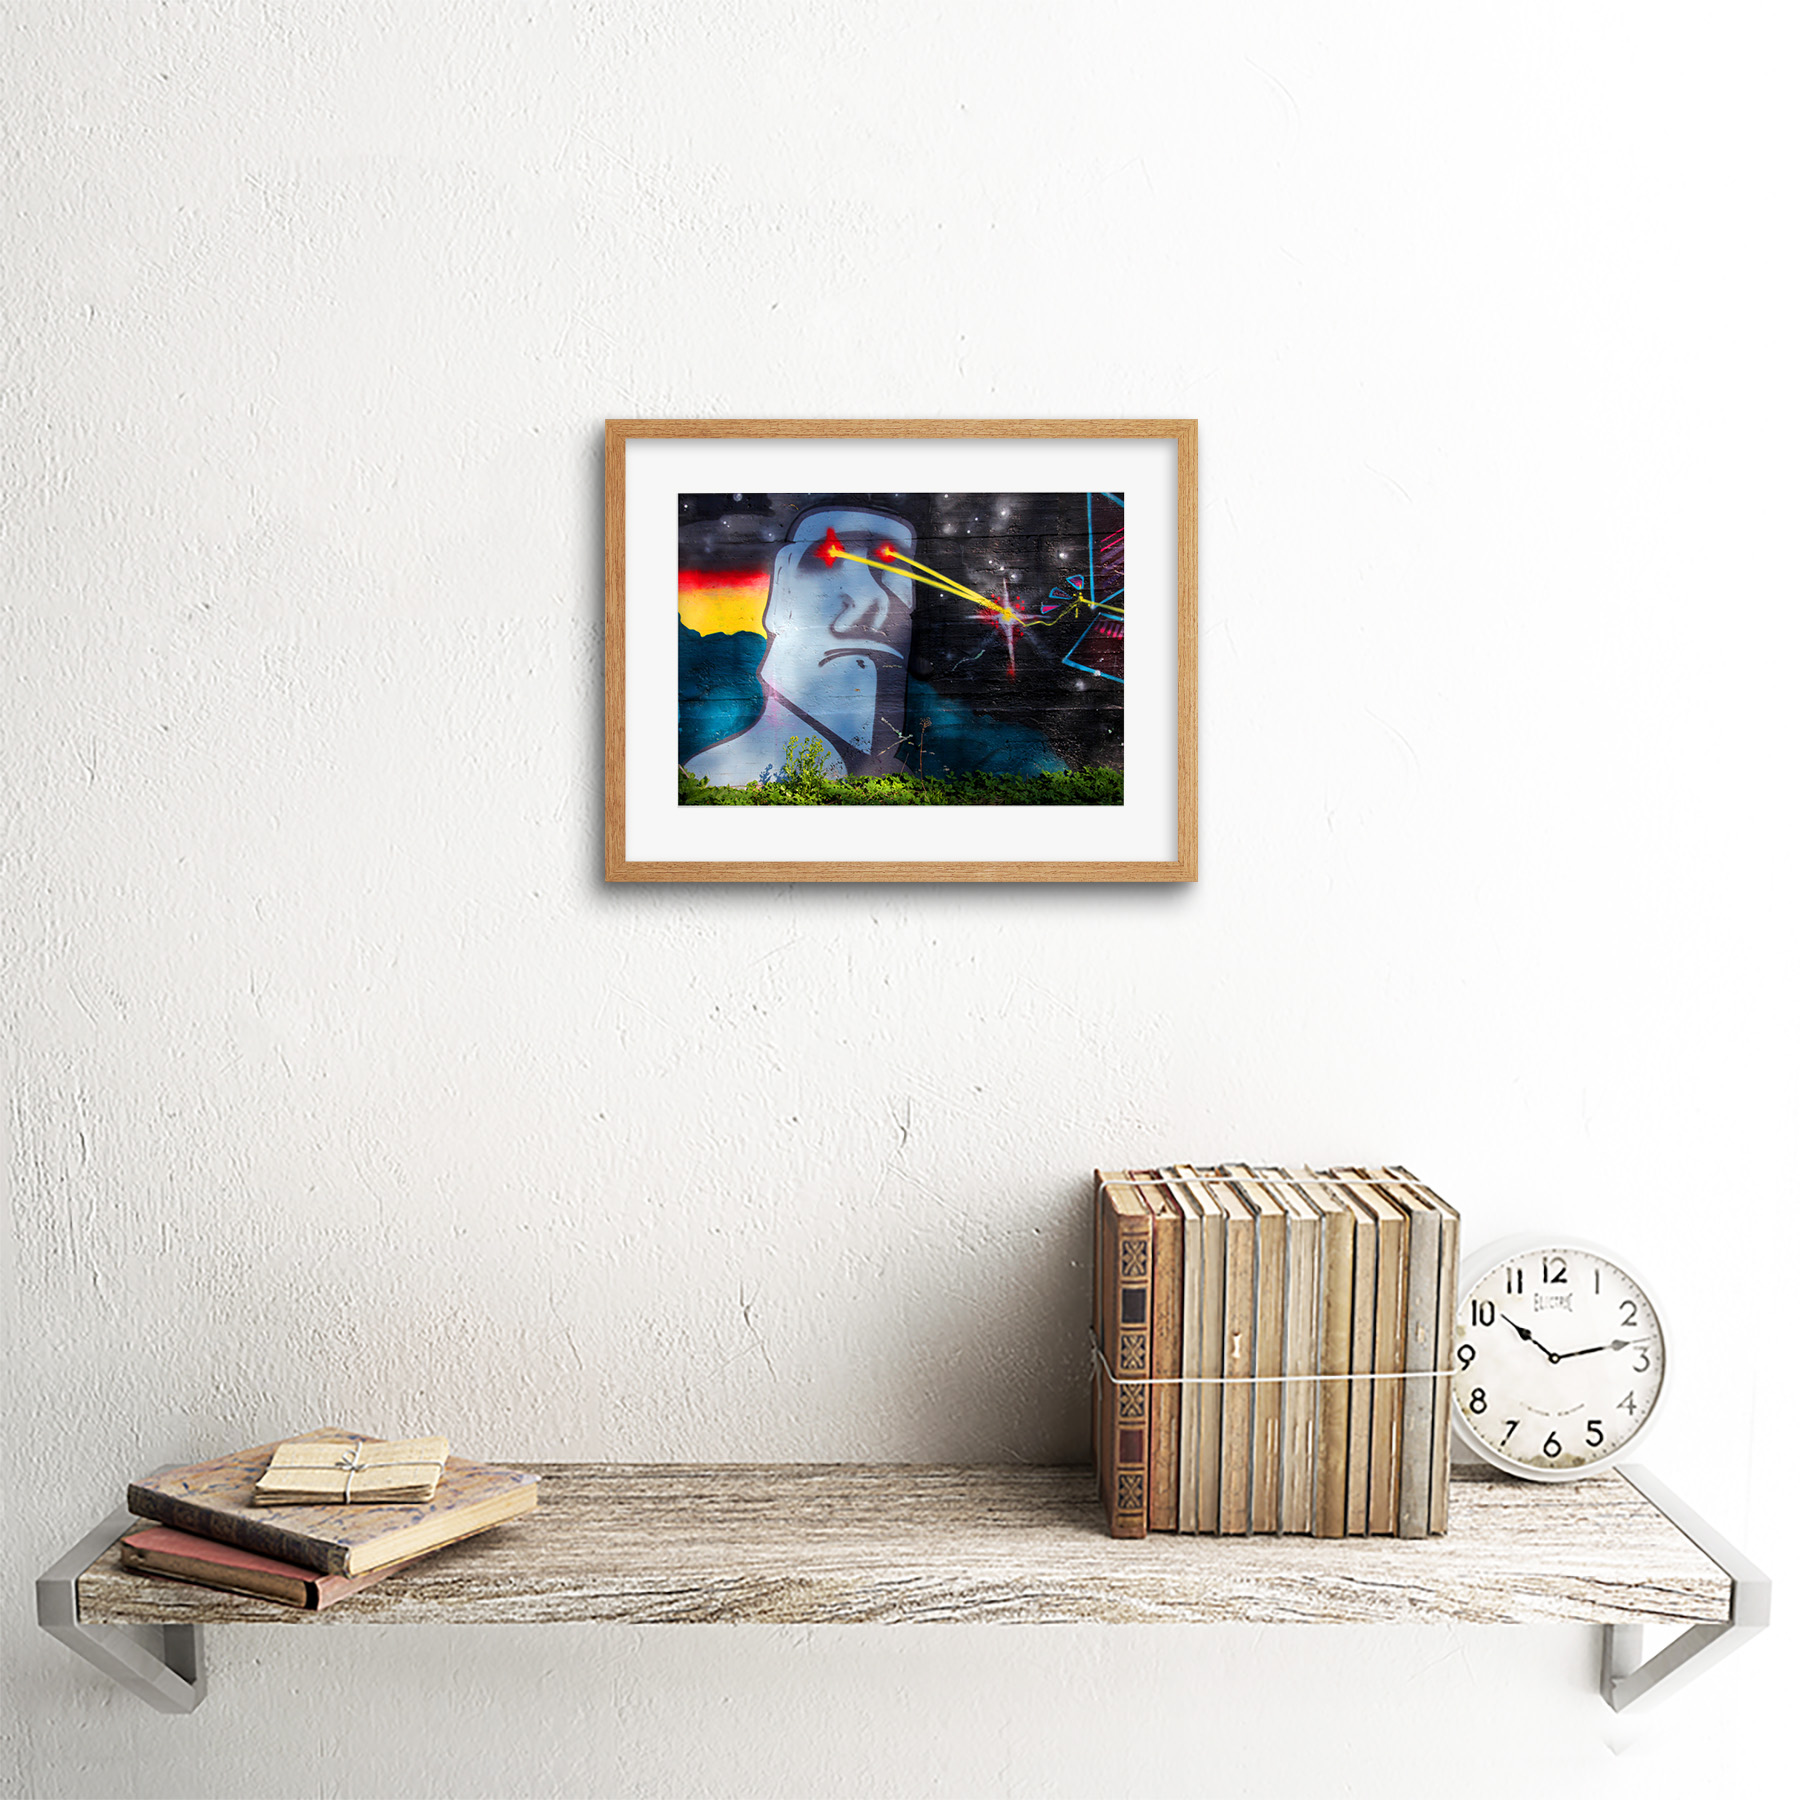 Graffiti-Easter-Island-Head-Laser-Art-Print-Framed-Poster-Wall-Decor miniature 13